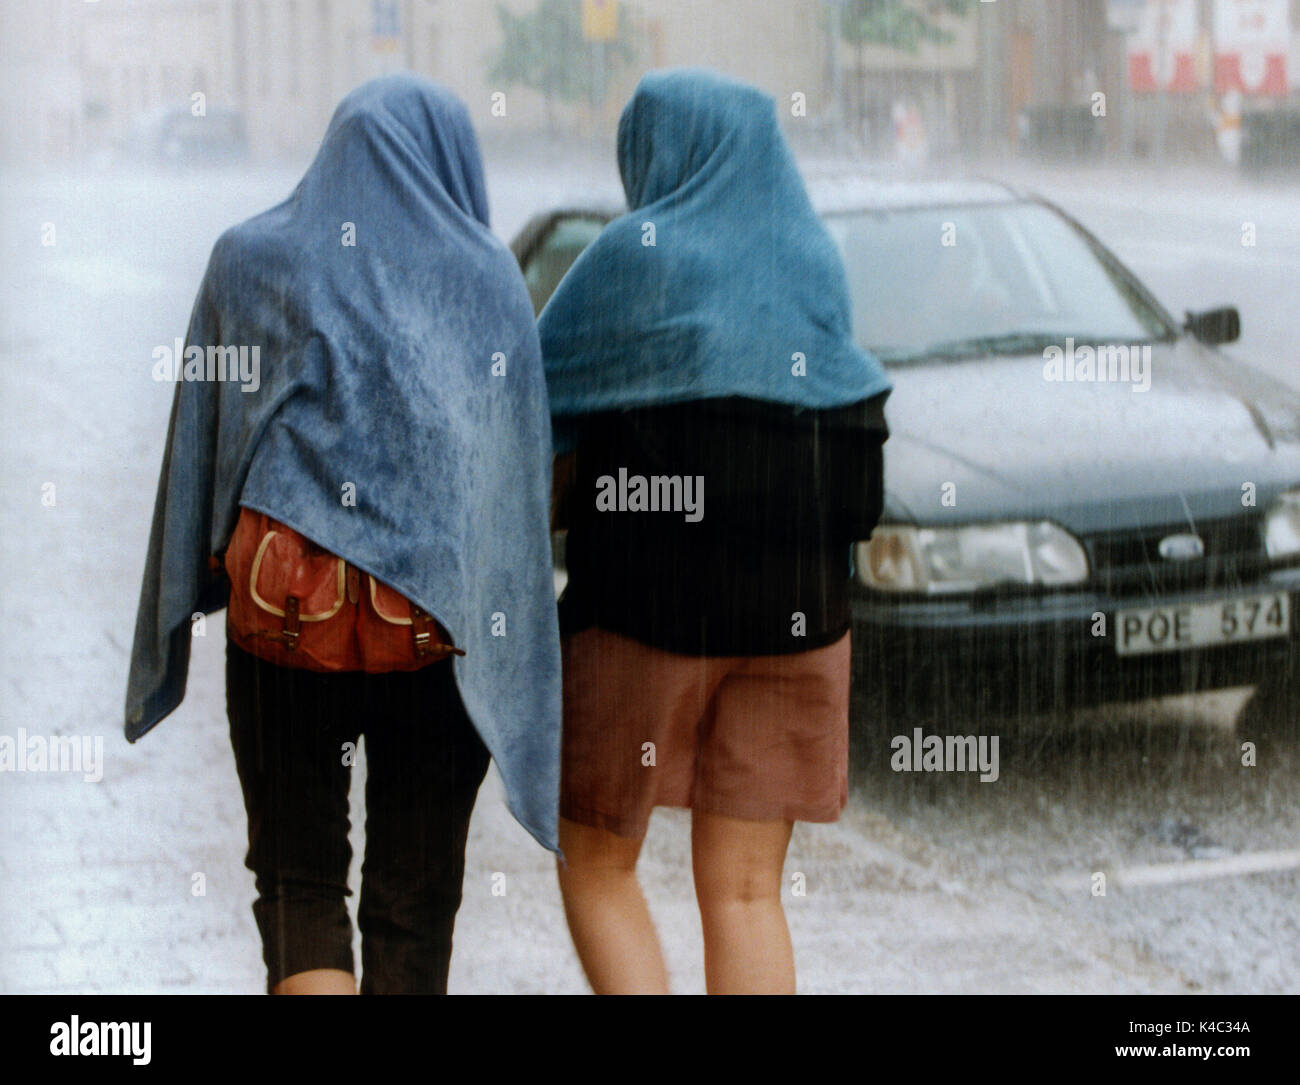 TWO WOMEN walk when the rain drops down 2016 - Stock Image